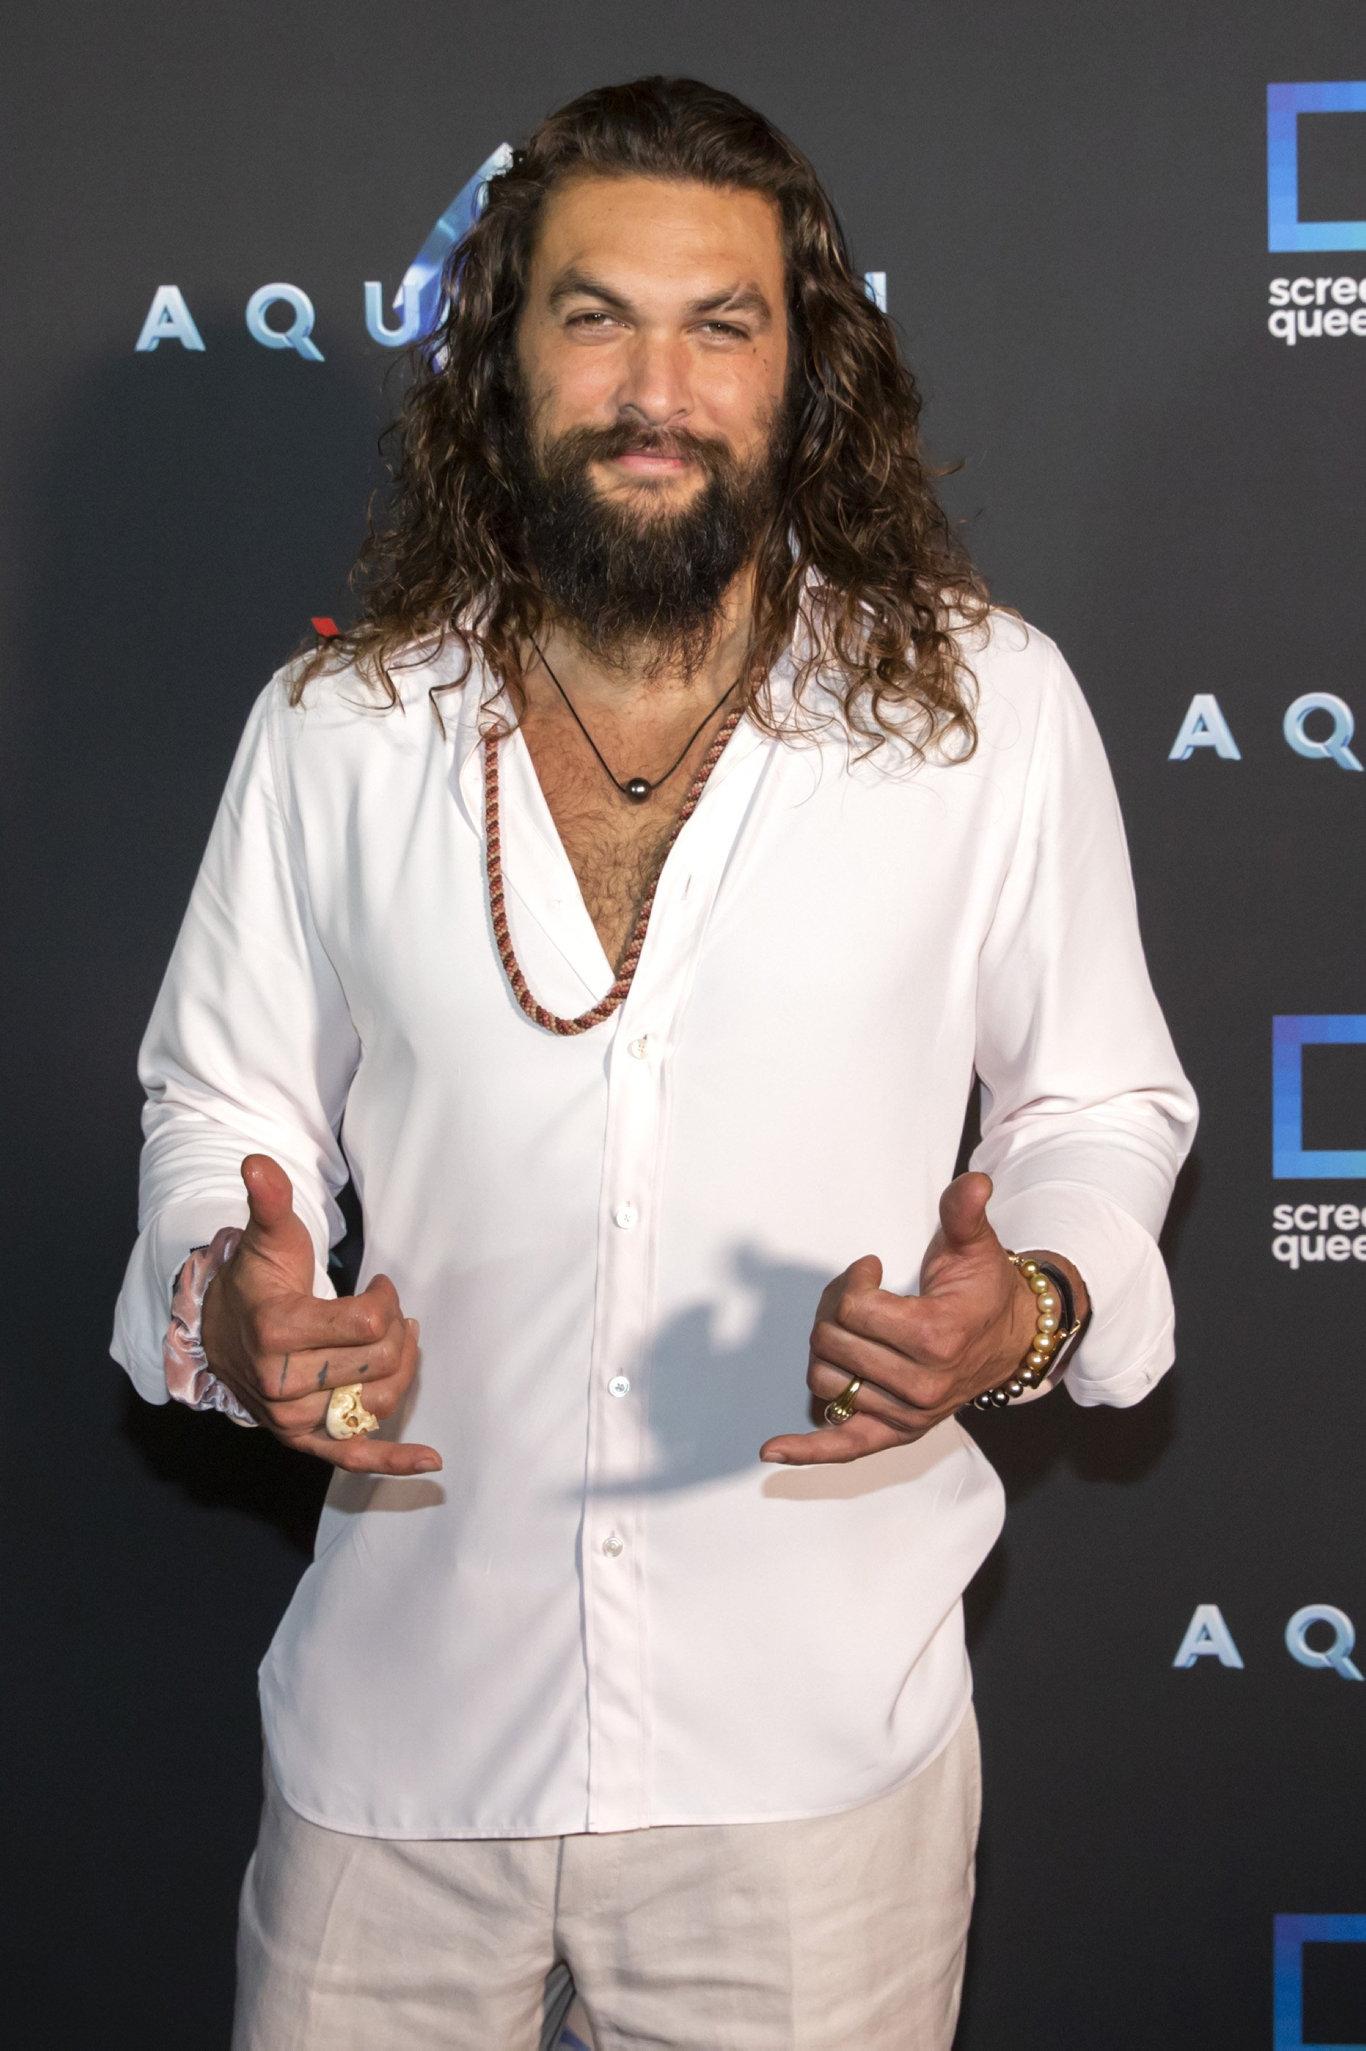 Jason Momoa at the Australian premiere of the movie Aquaman at Robina on the Gold Coast.